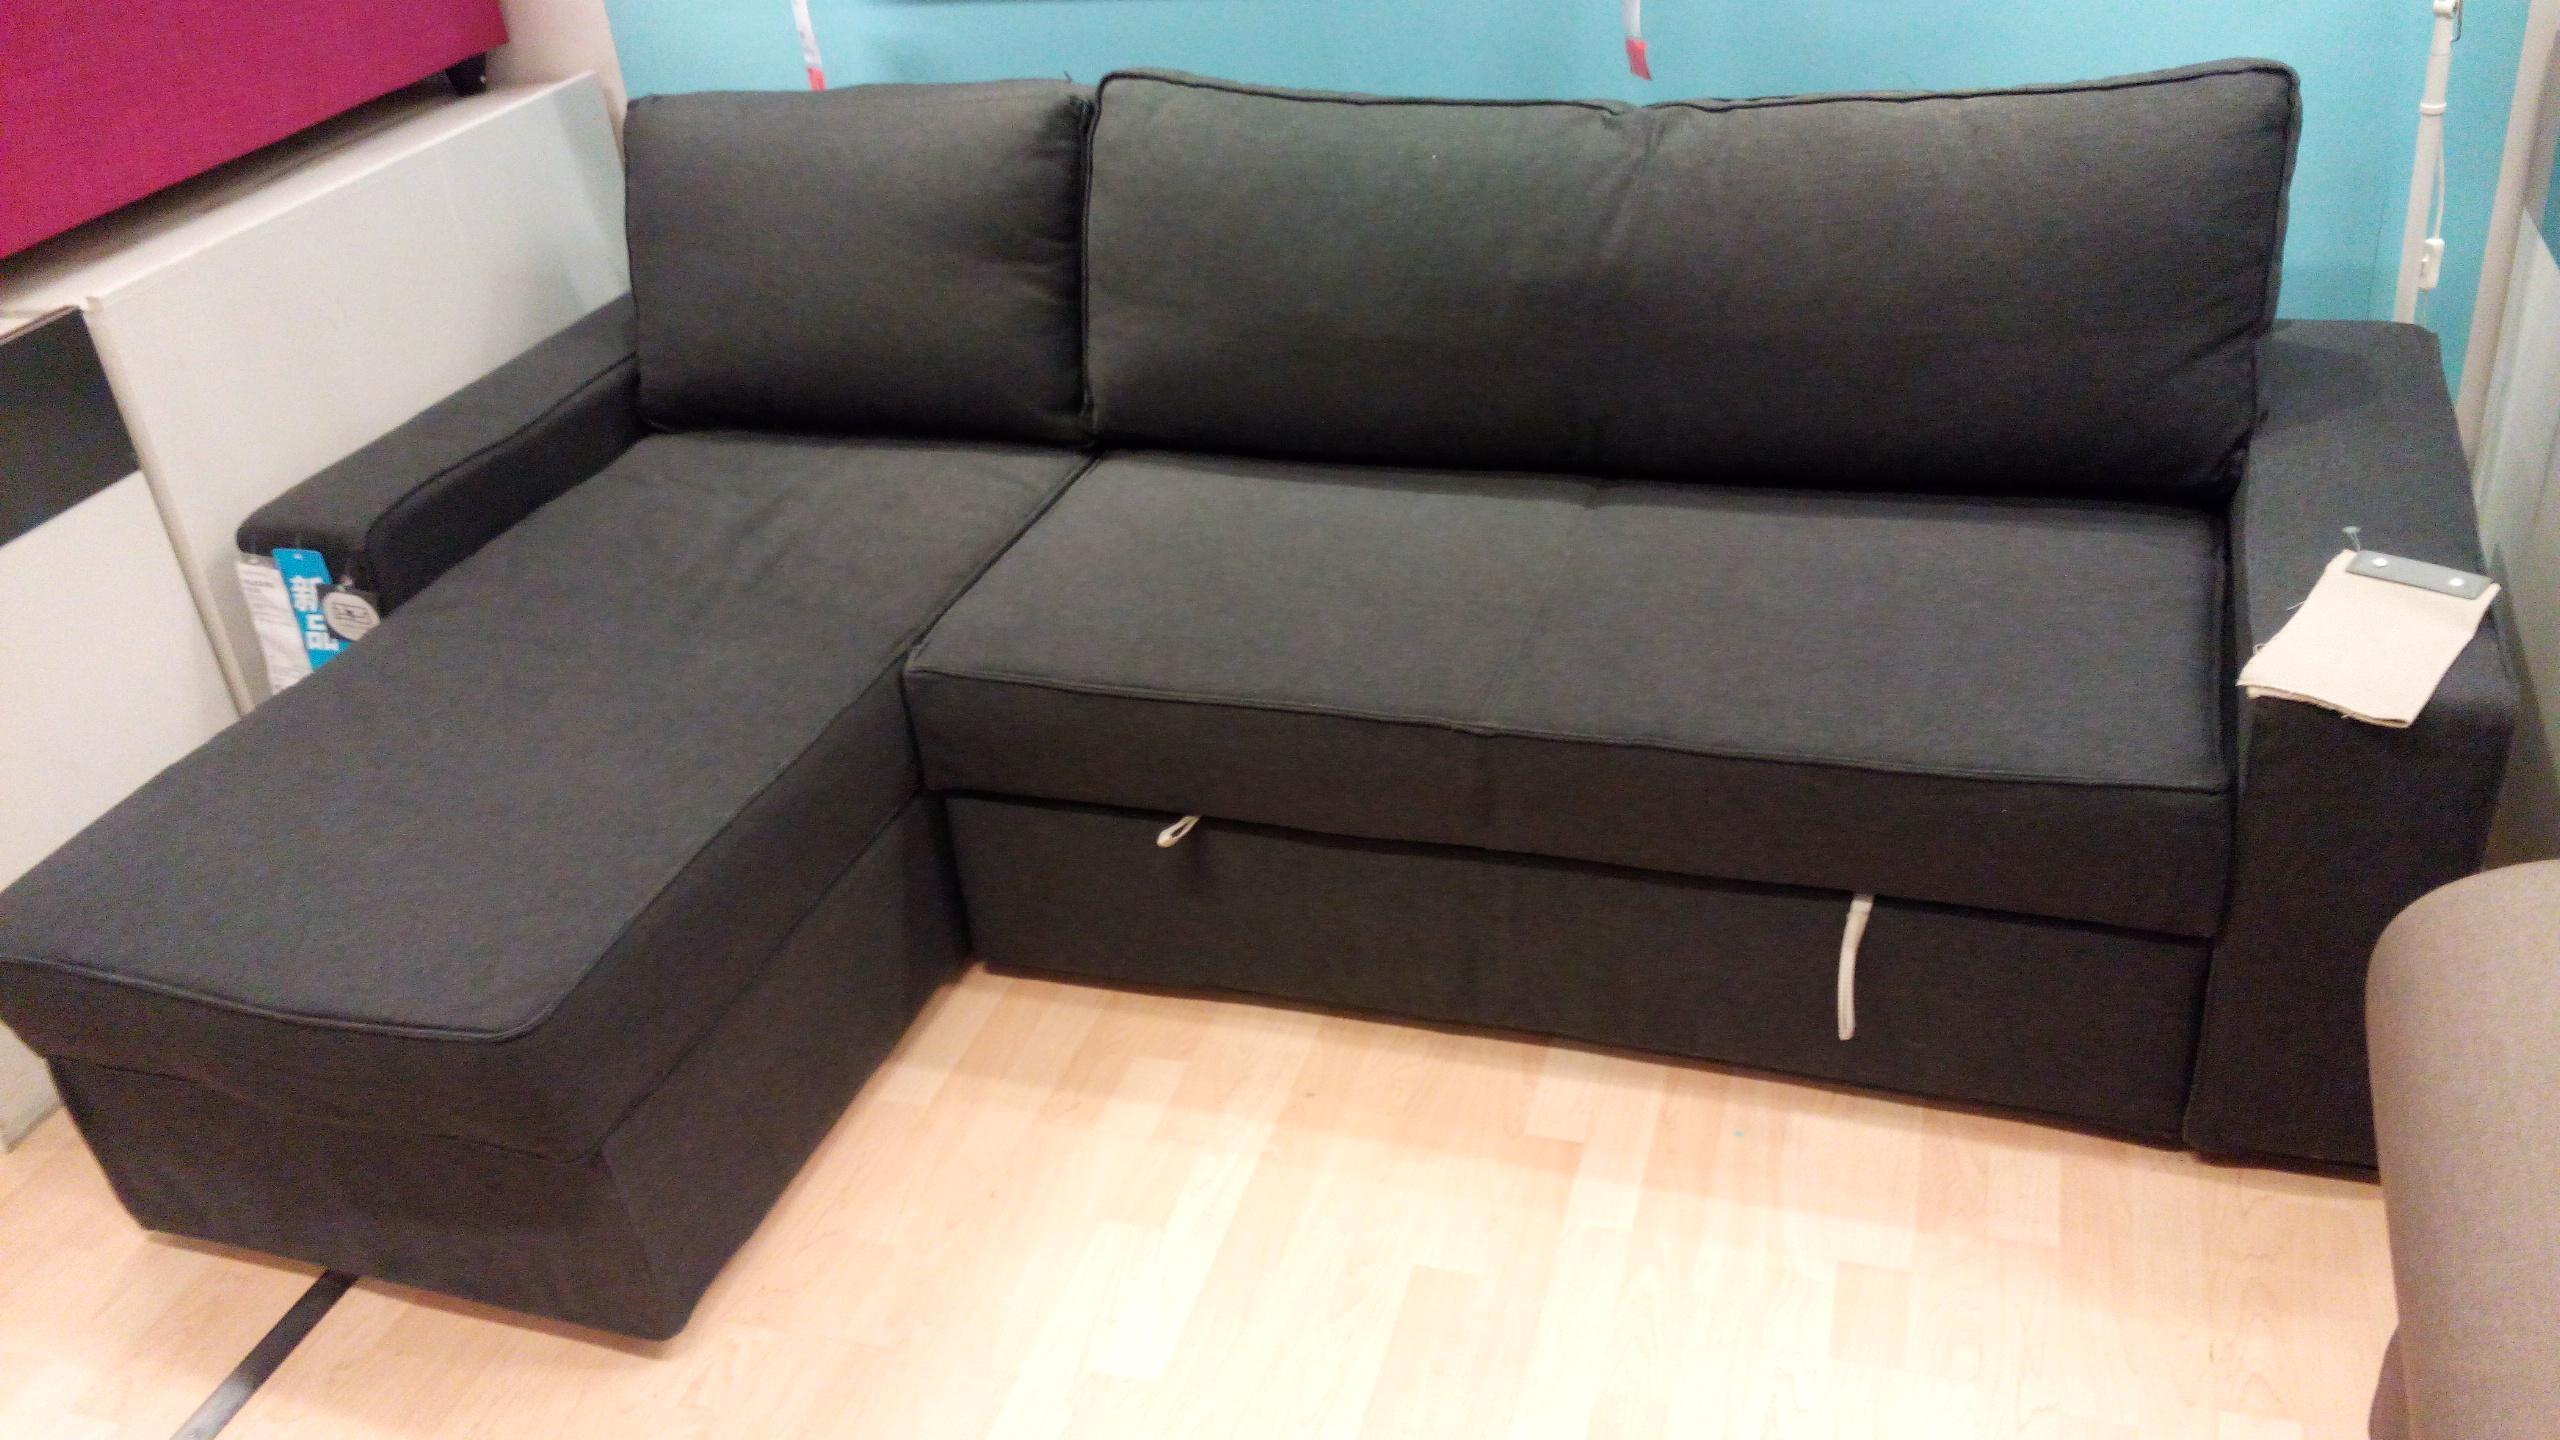 Ikea Vilasund And Backabro Review – Return Of The Sofa Bed Clones! Regarding Manstad Sofa Bed (Image 11 of 20)